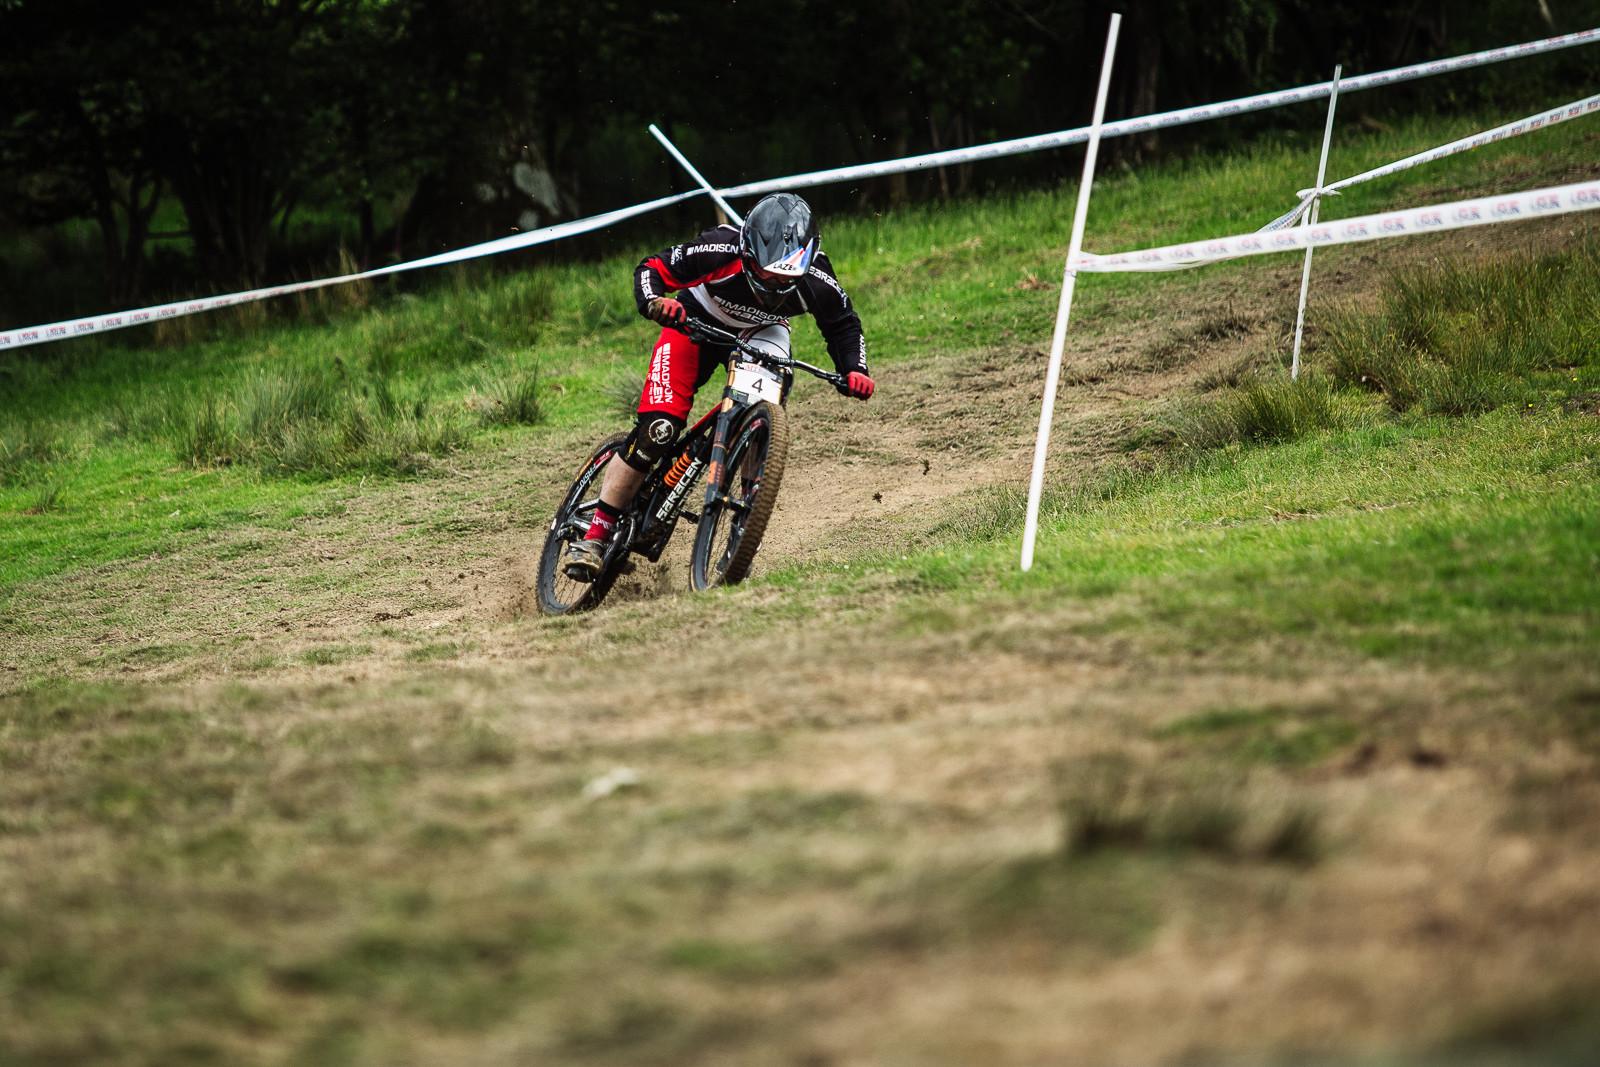 Matt Simmonds, British DH Series, Bala - RACE REPORT - 2015 British Downhill Series Bala - Mountain Biking Pictures - Vital MTB